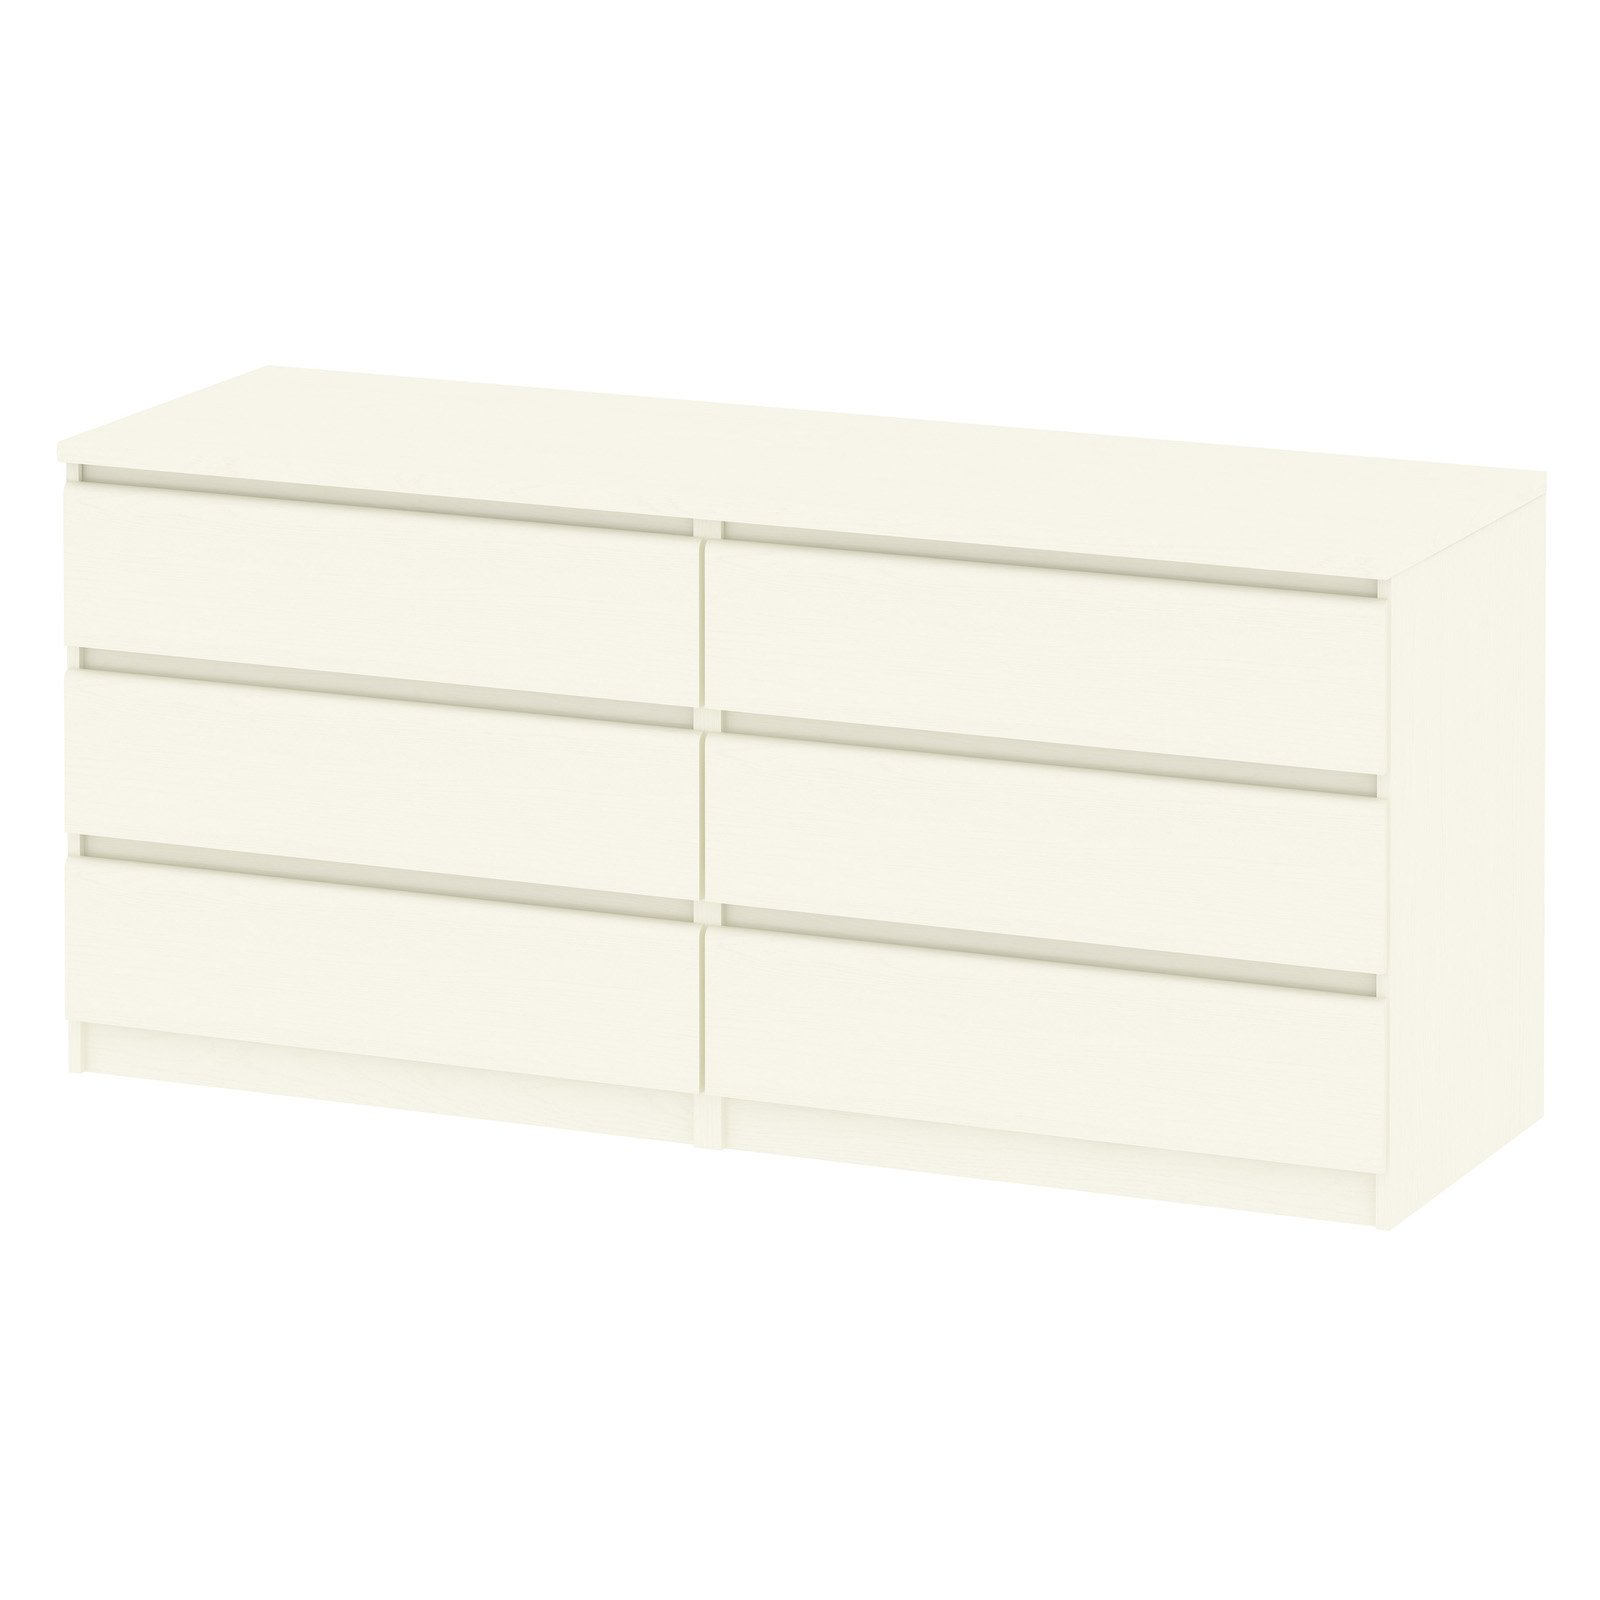 Scottsdale 6-Drawer Double Dresser, Off White by Tvilum